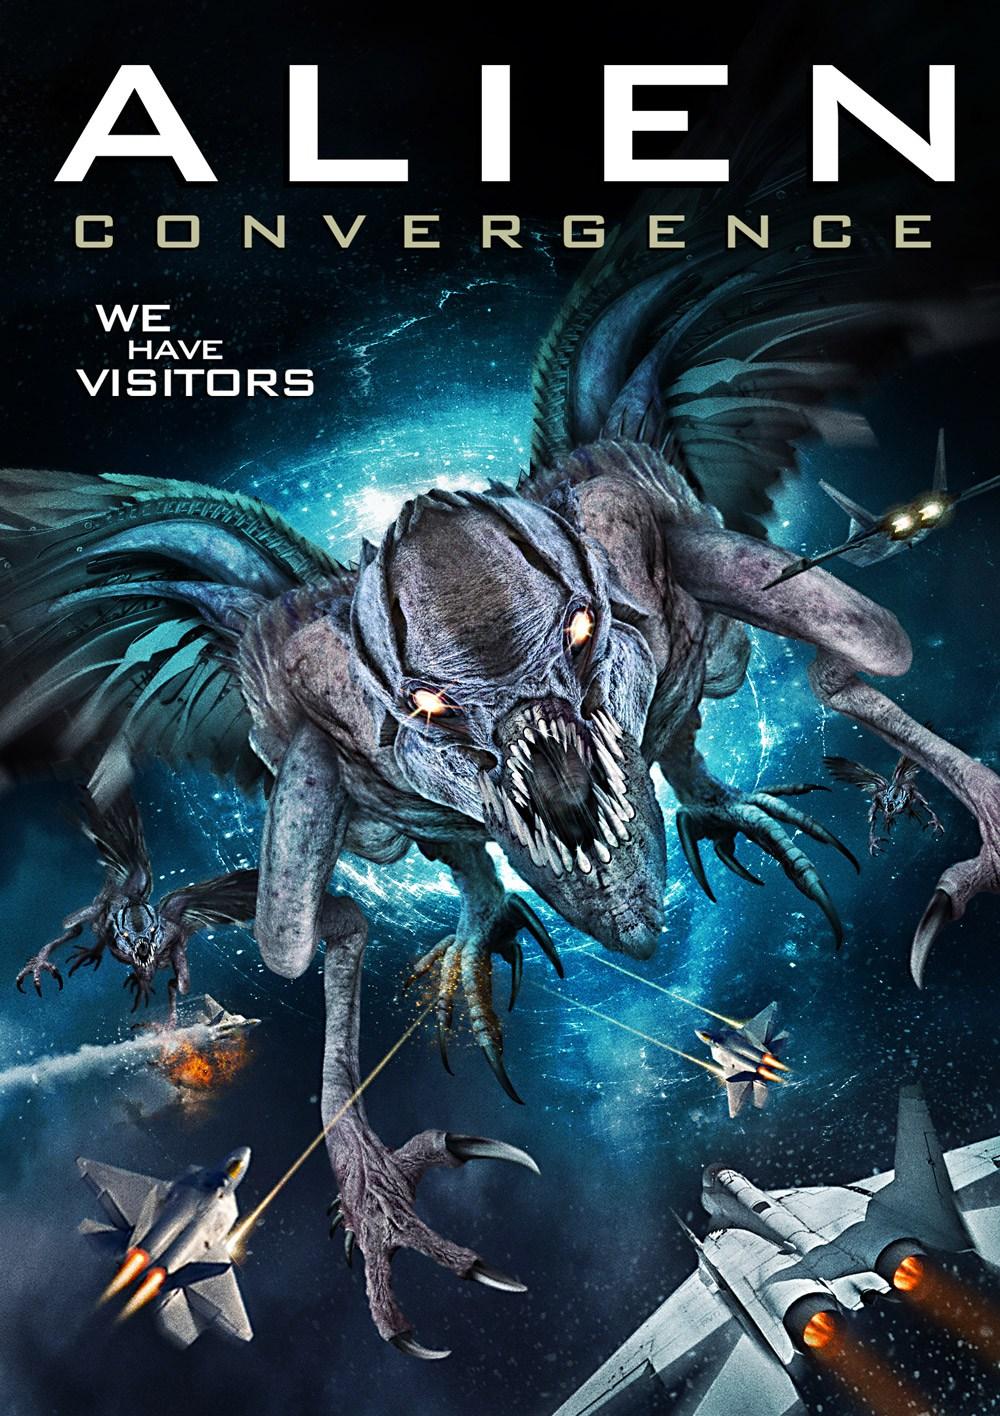 Alien Convergence 2017 Legendado